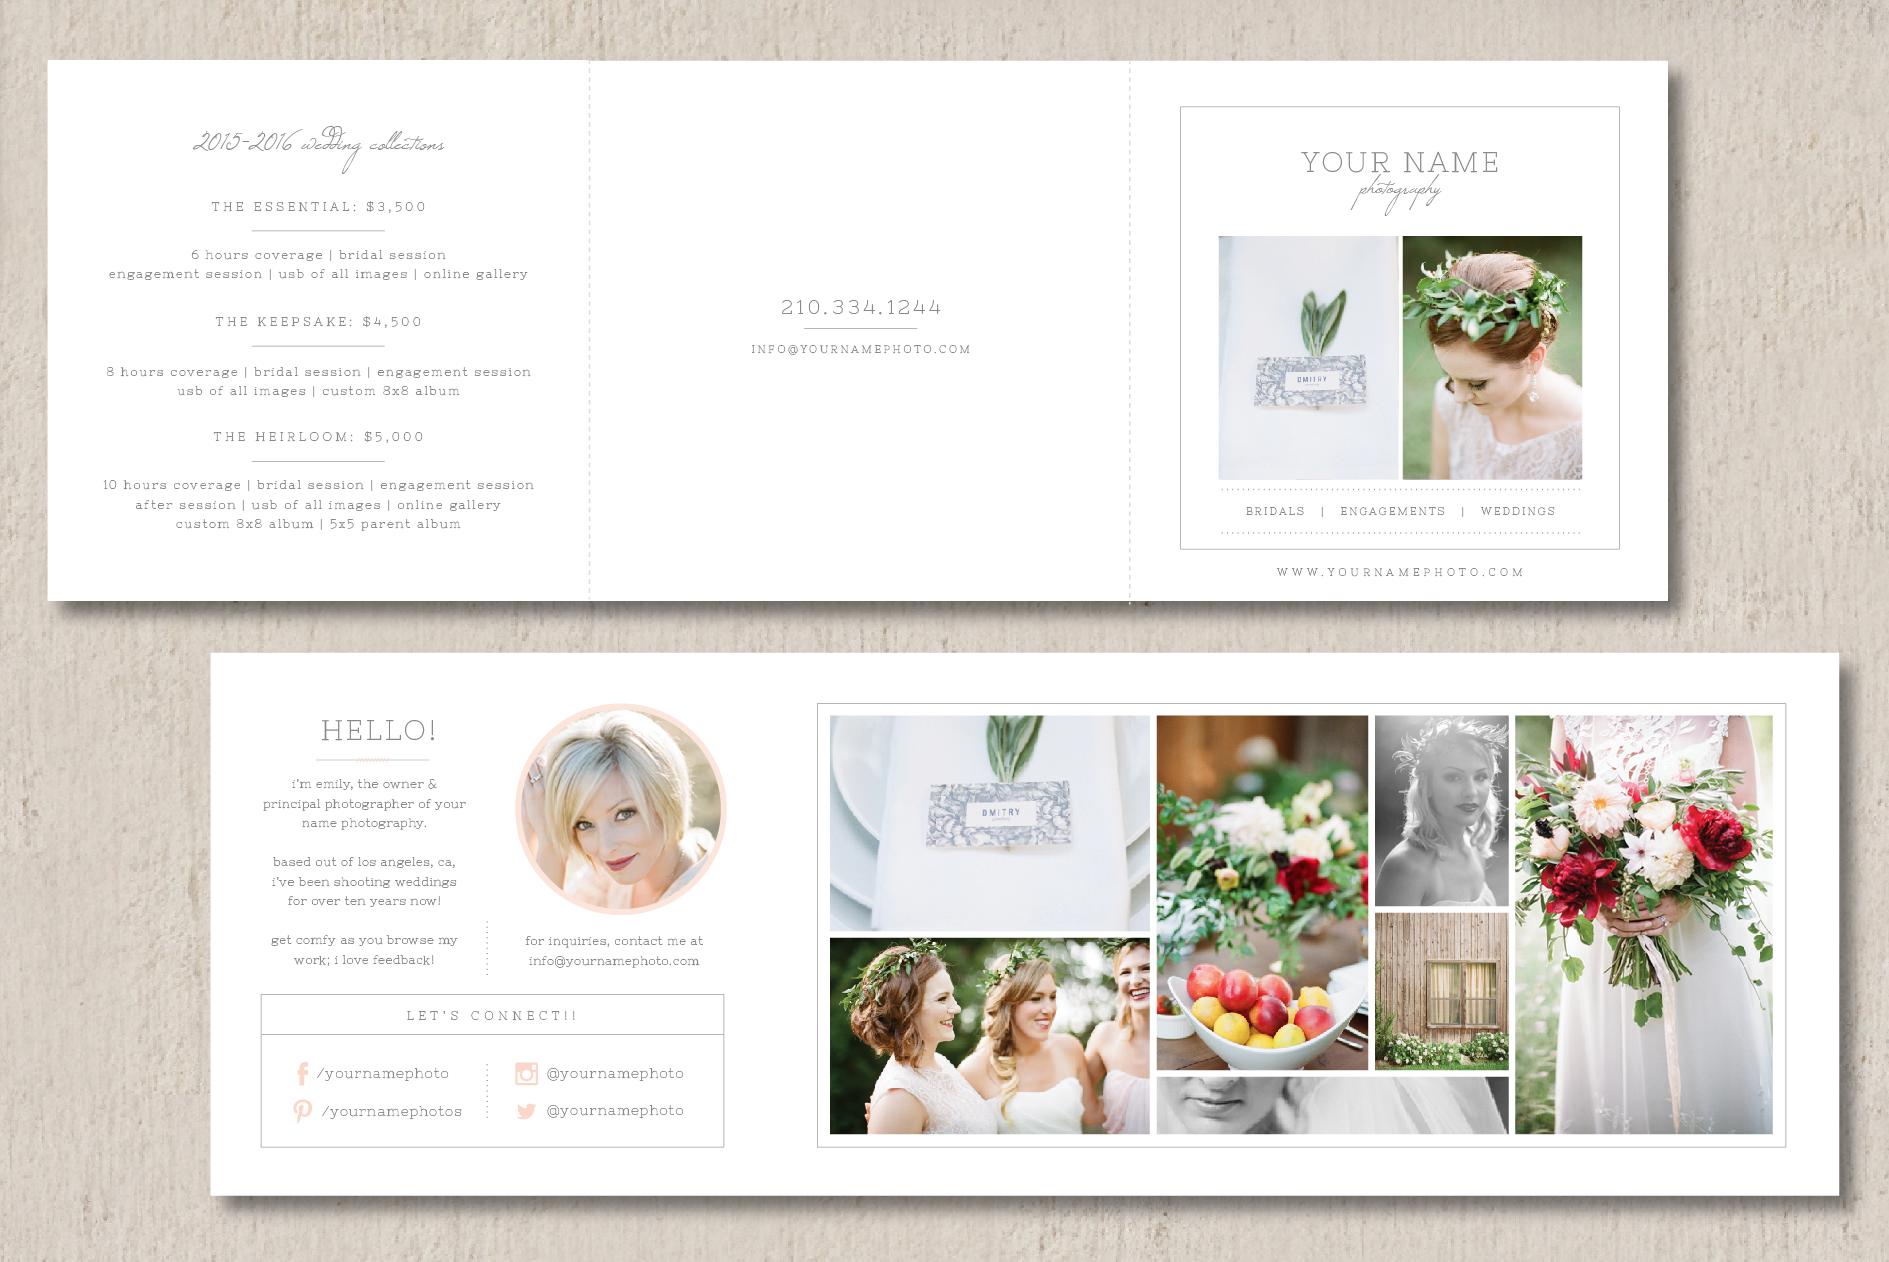 price list brochure template - wedding photography price list brochure templates on